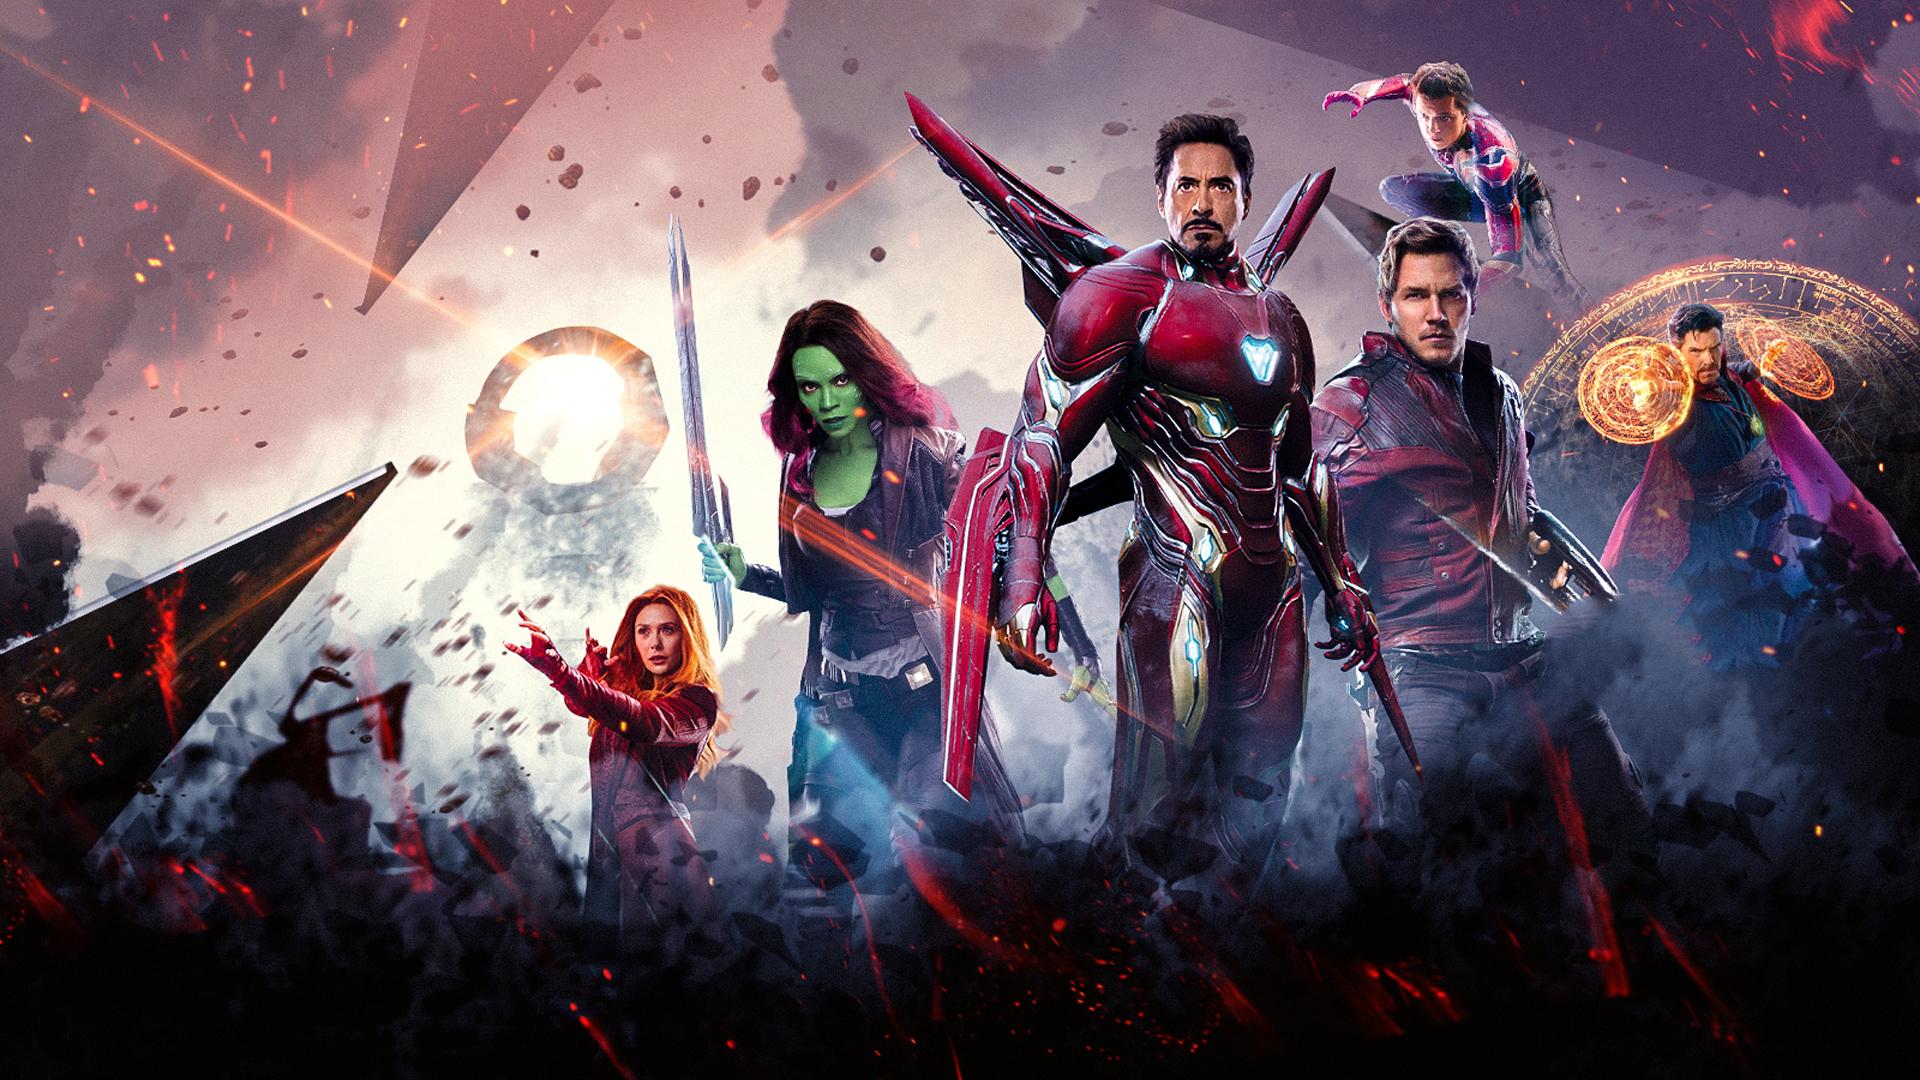 Shuri In Avengers Infinity War New Poster Hd Movies 4k: Avengers Infinity War Poster 2018, HD Movies, 4k